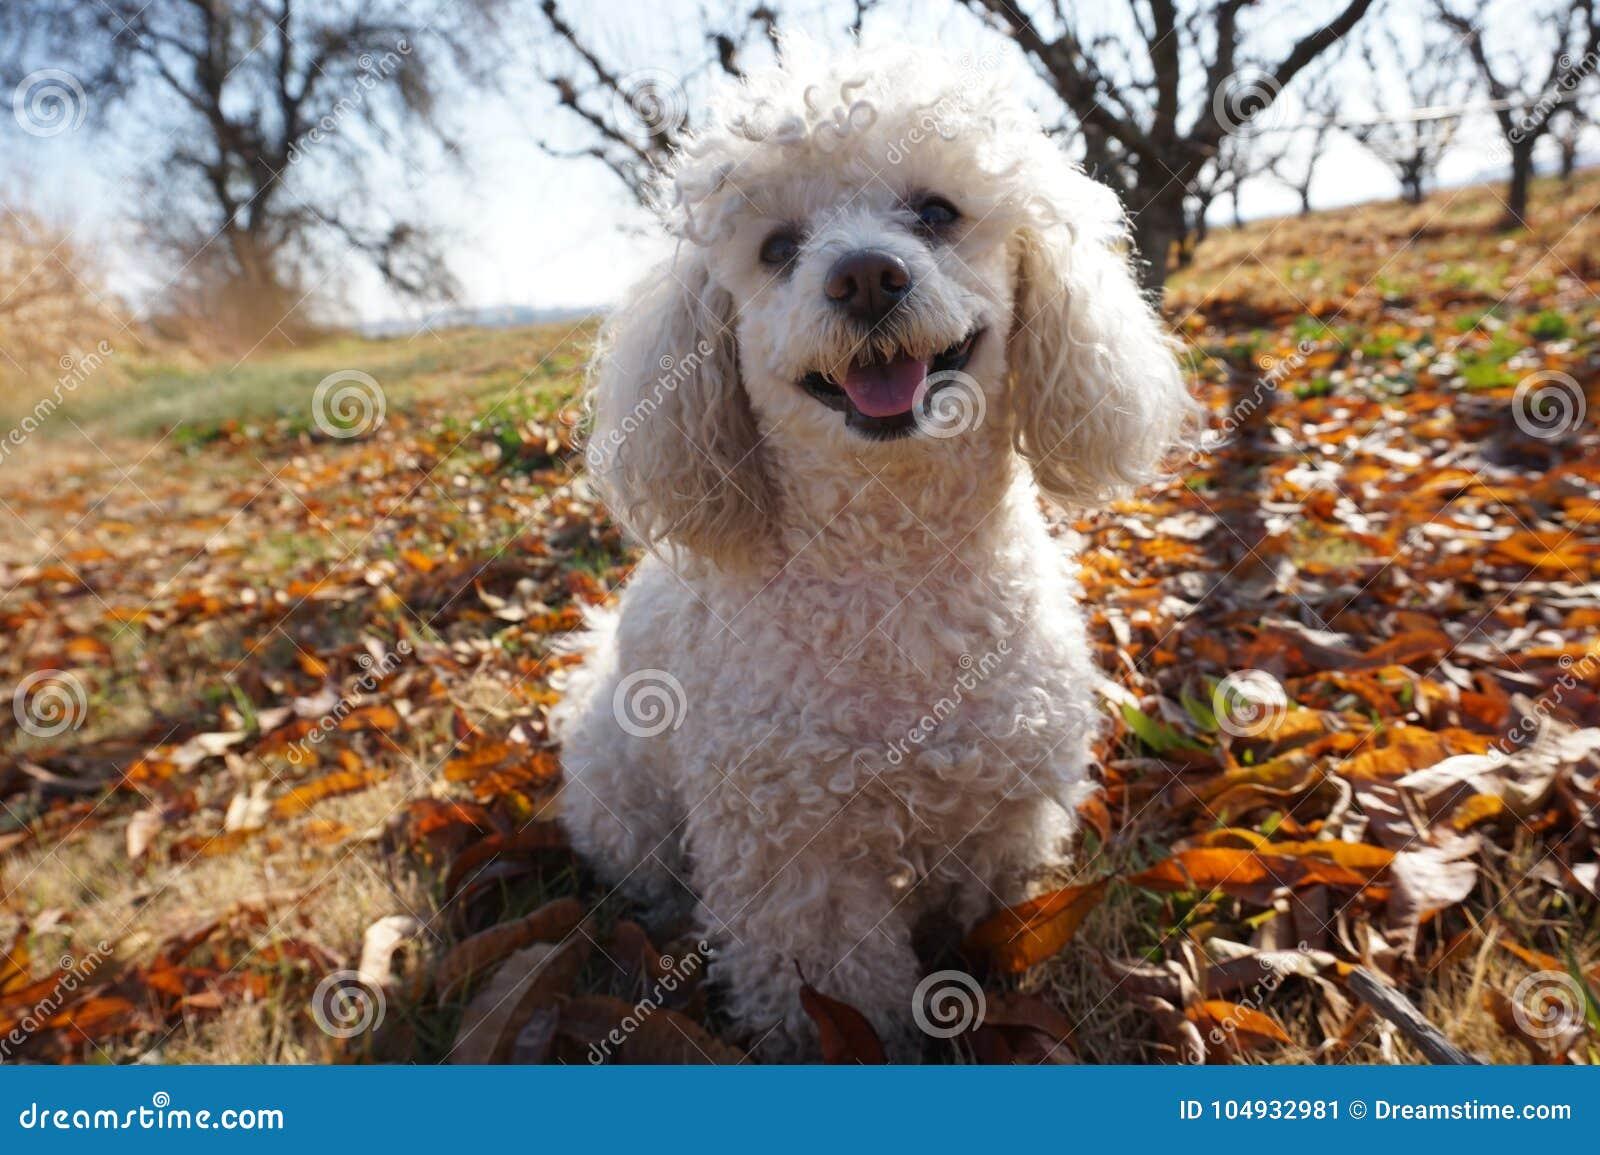 White poodle dog smiling happily